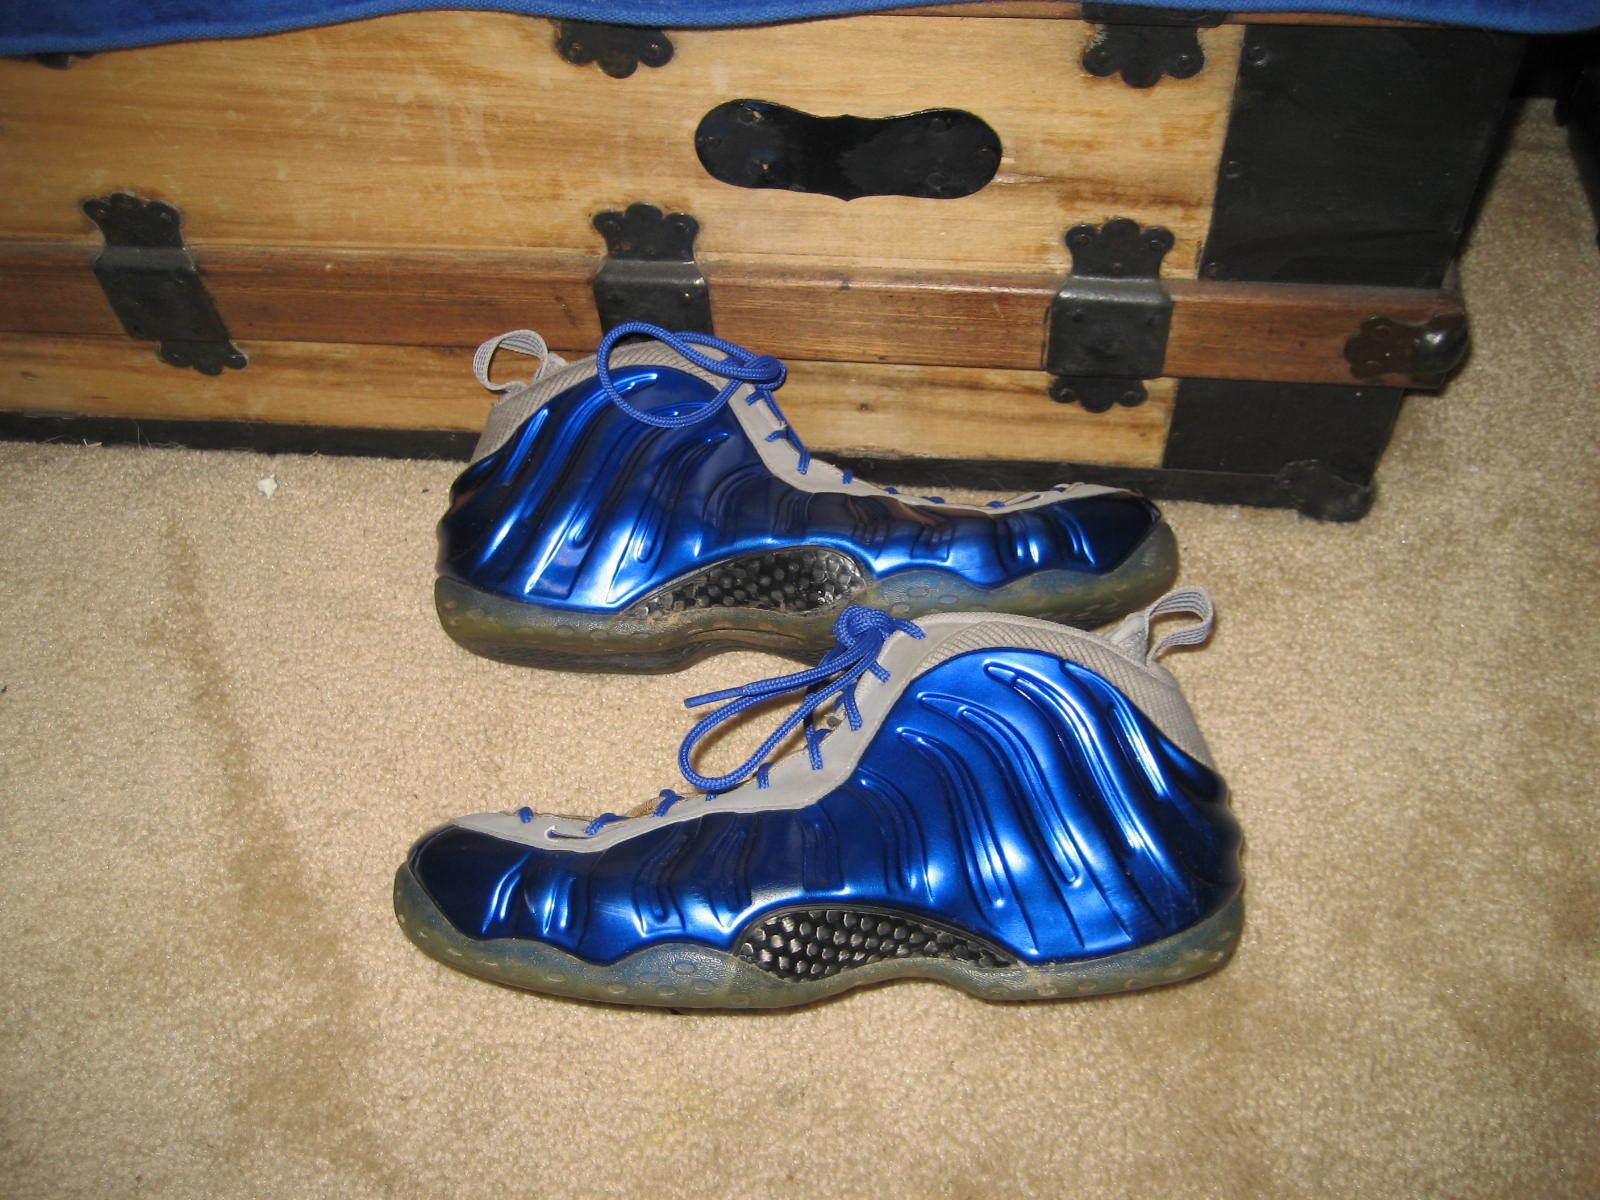 Nike air foamposite uno sport royal blue wolf grey penny hardaway taglia 10